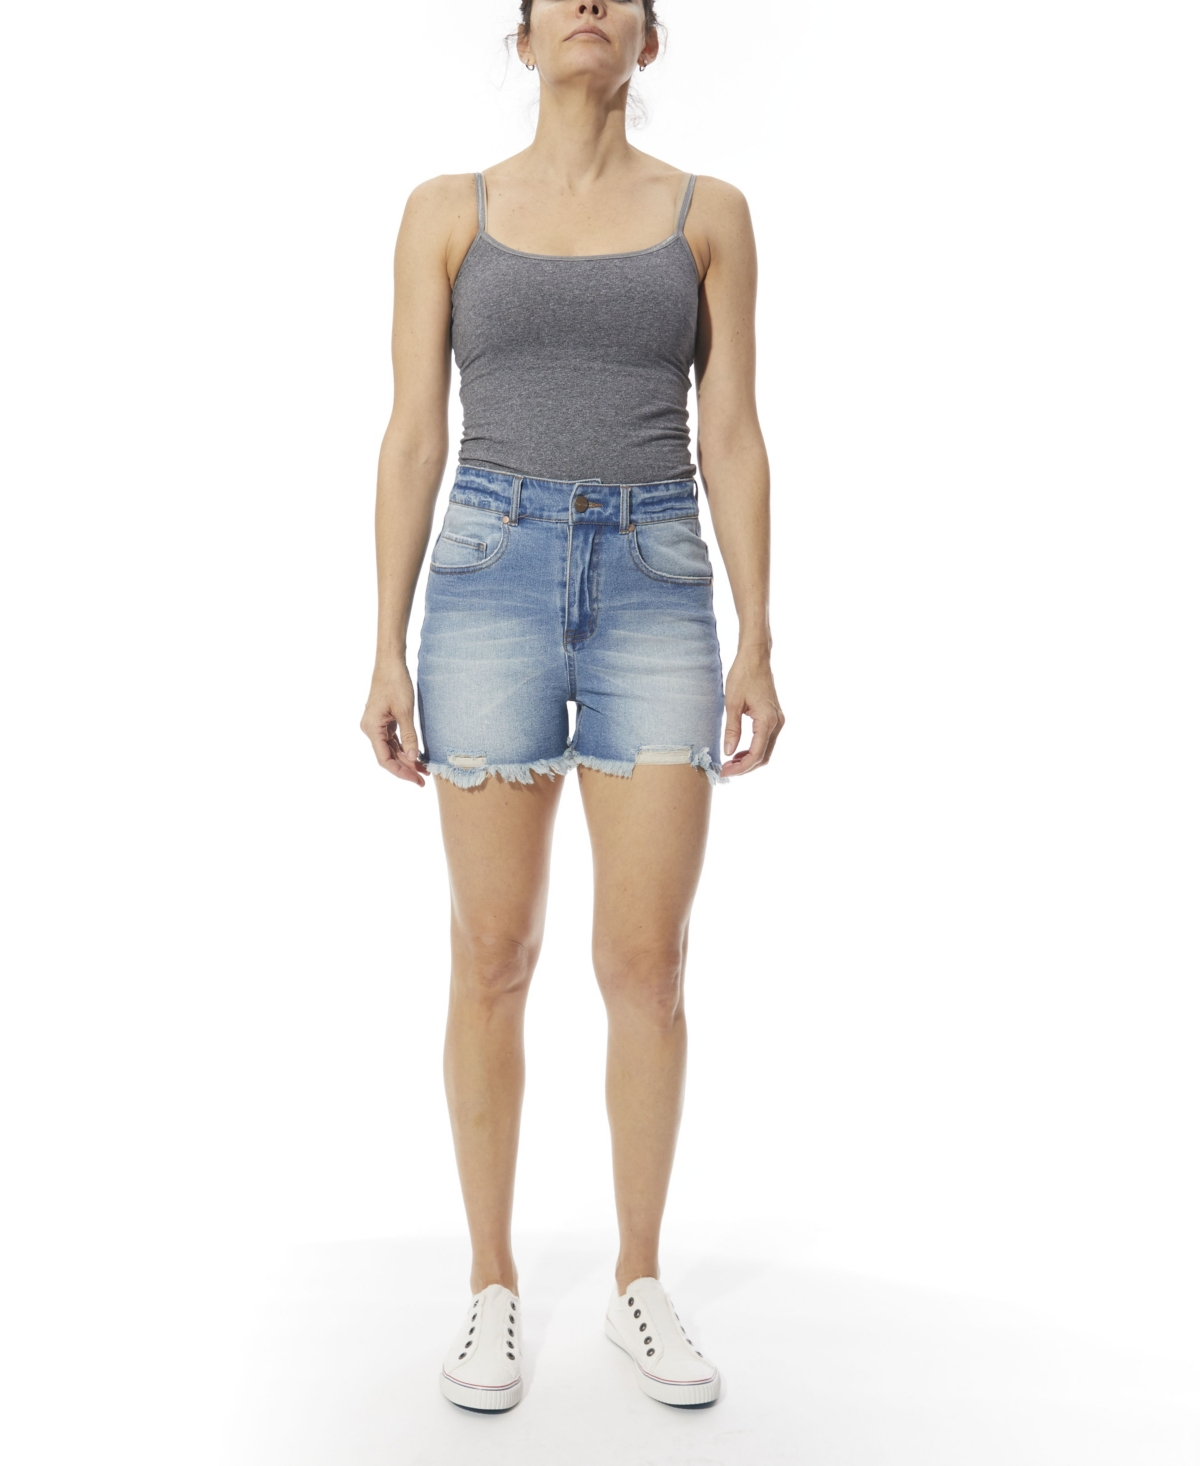 Women's Frayed Abrasions Denim Shorts